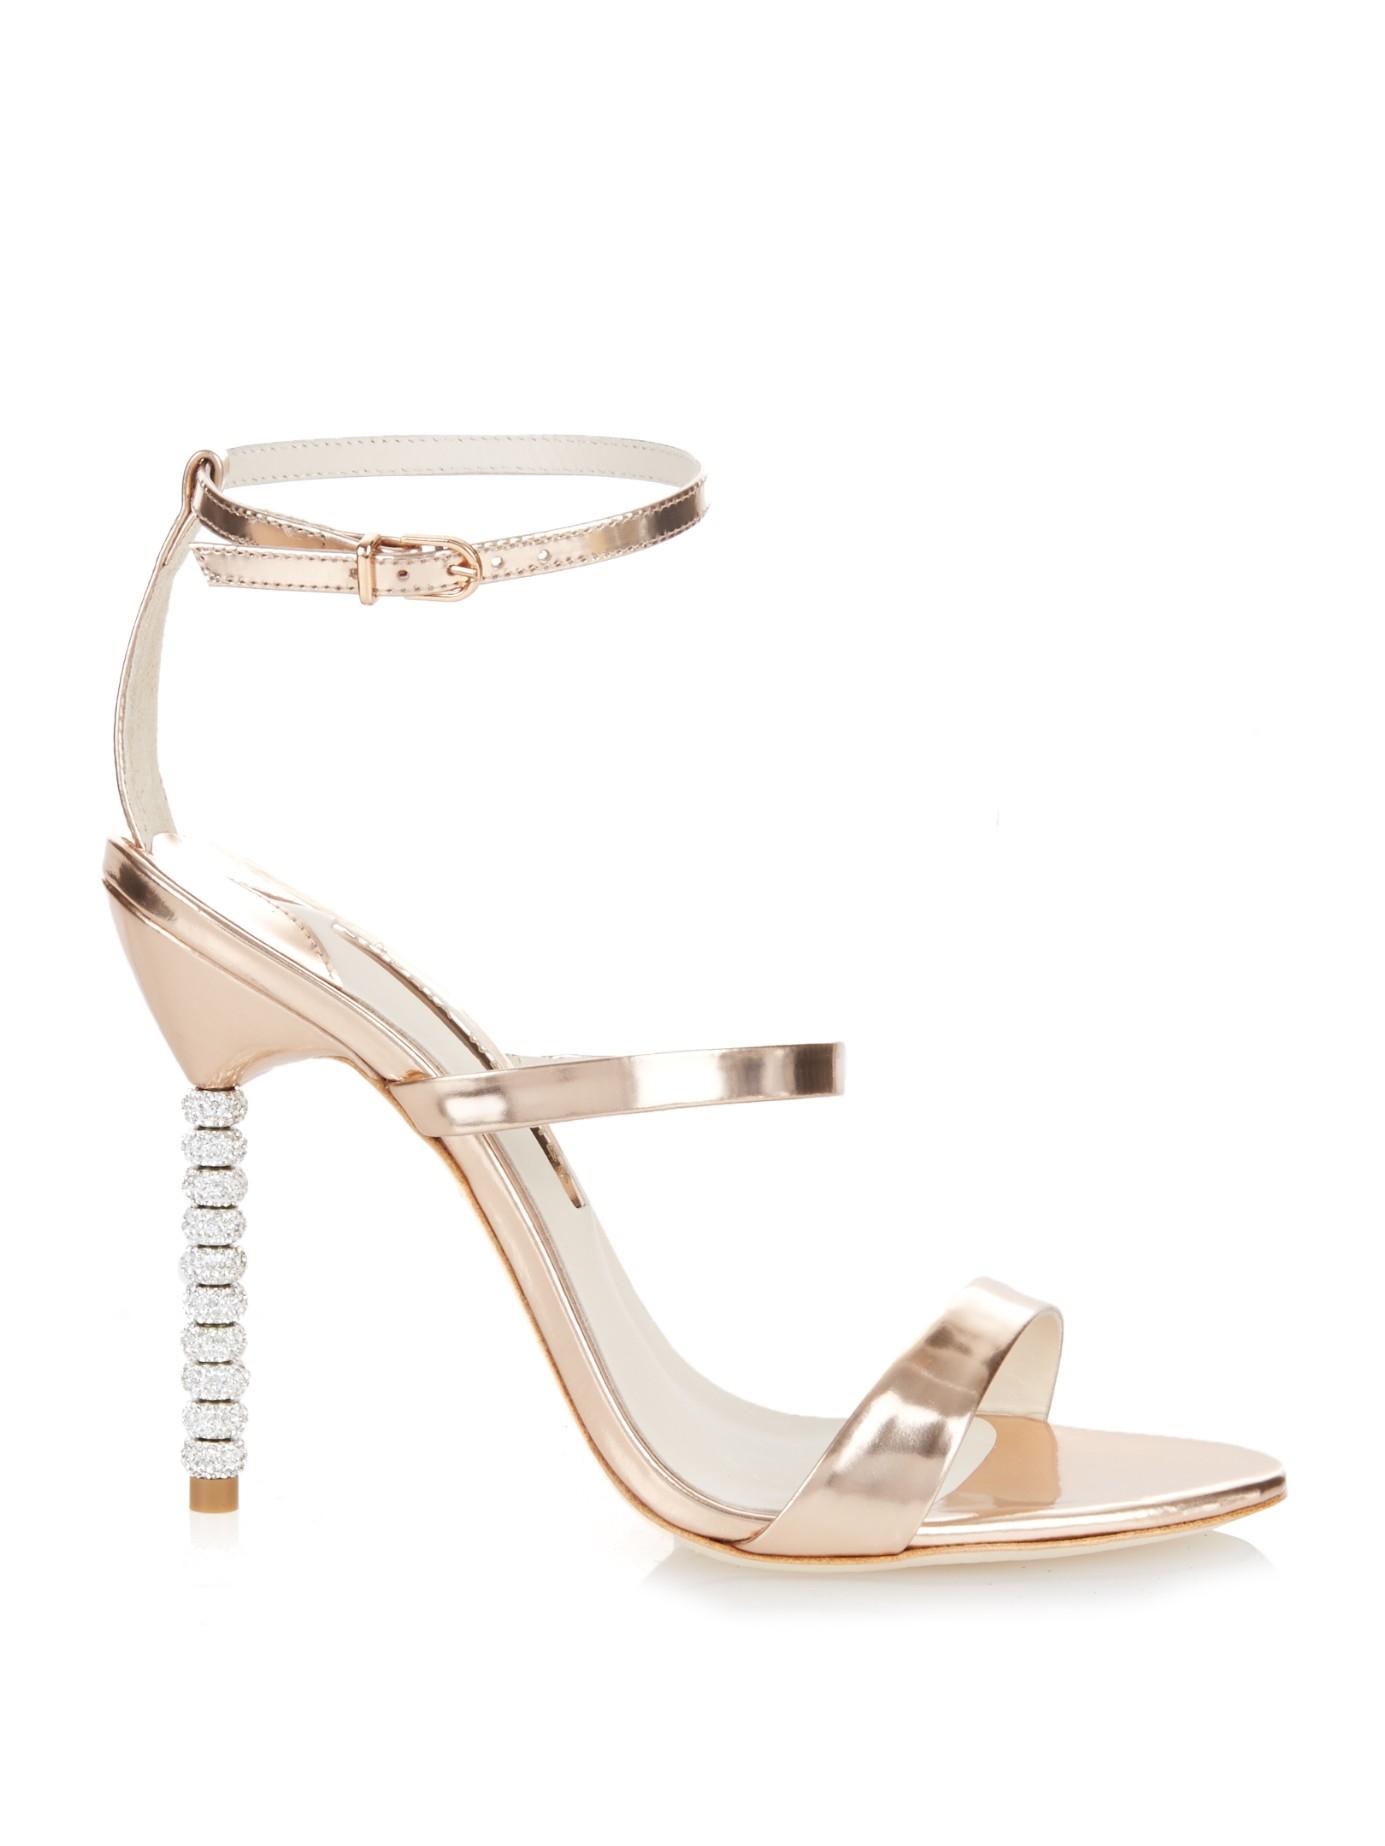 5e9a8d32fa90 Lyst - Sophia Webster Rosalind Crystal-Heel Metallic Leather Sandals ...